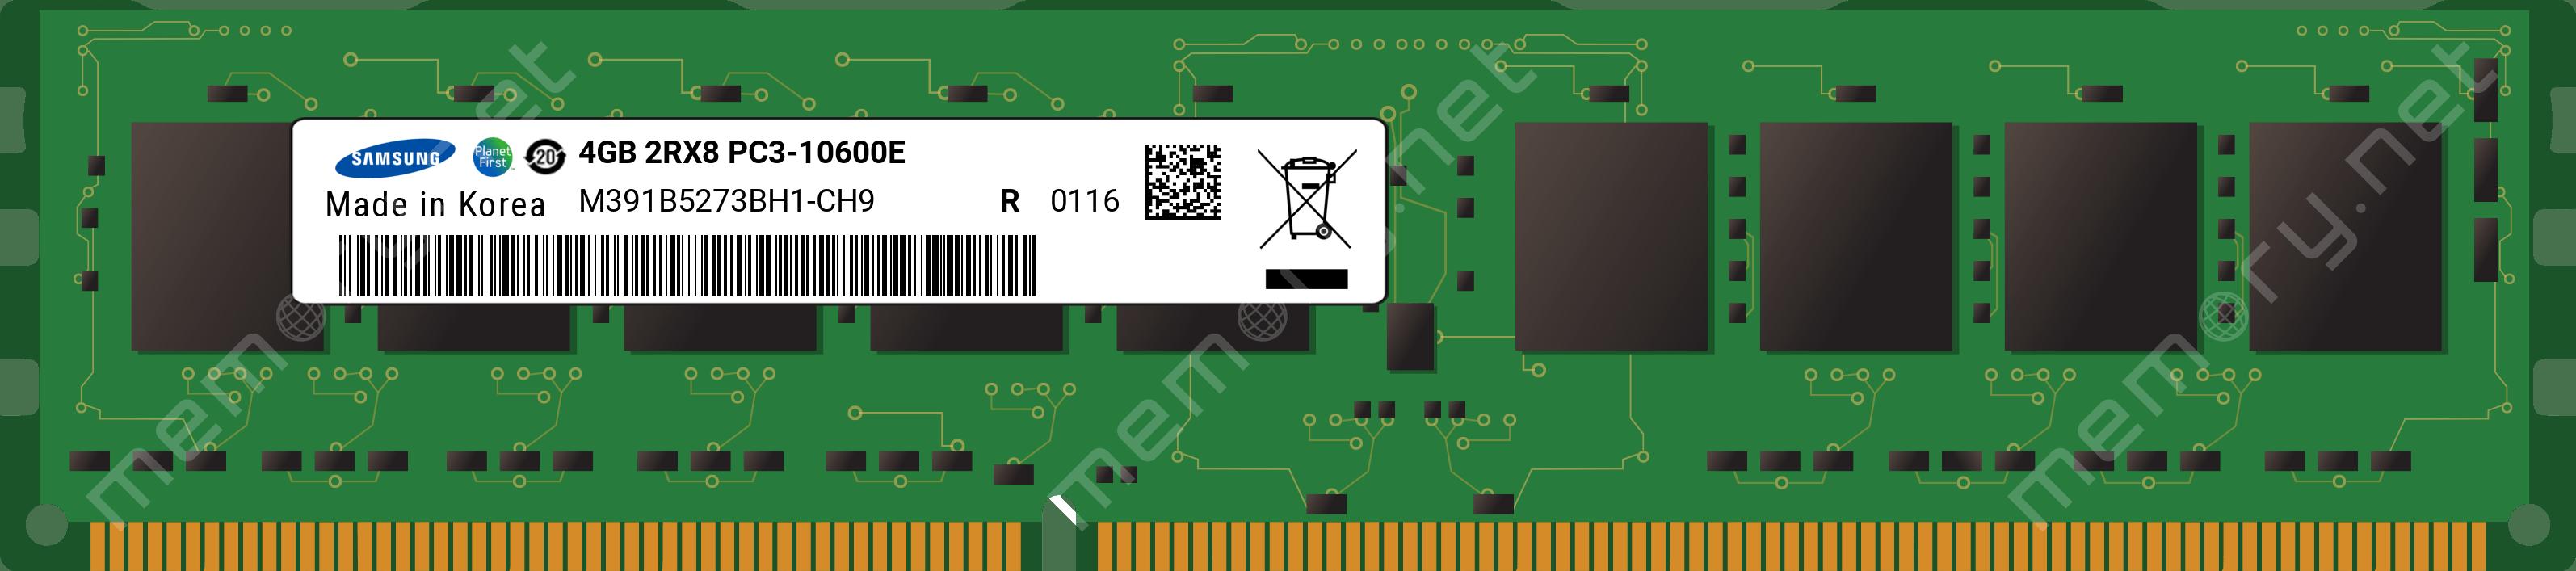 M391B5273BH1-CH9 4GB PC3-10600E DDR3-1333 2Rx8 ECC Non REG Memory